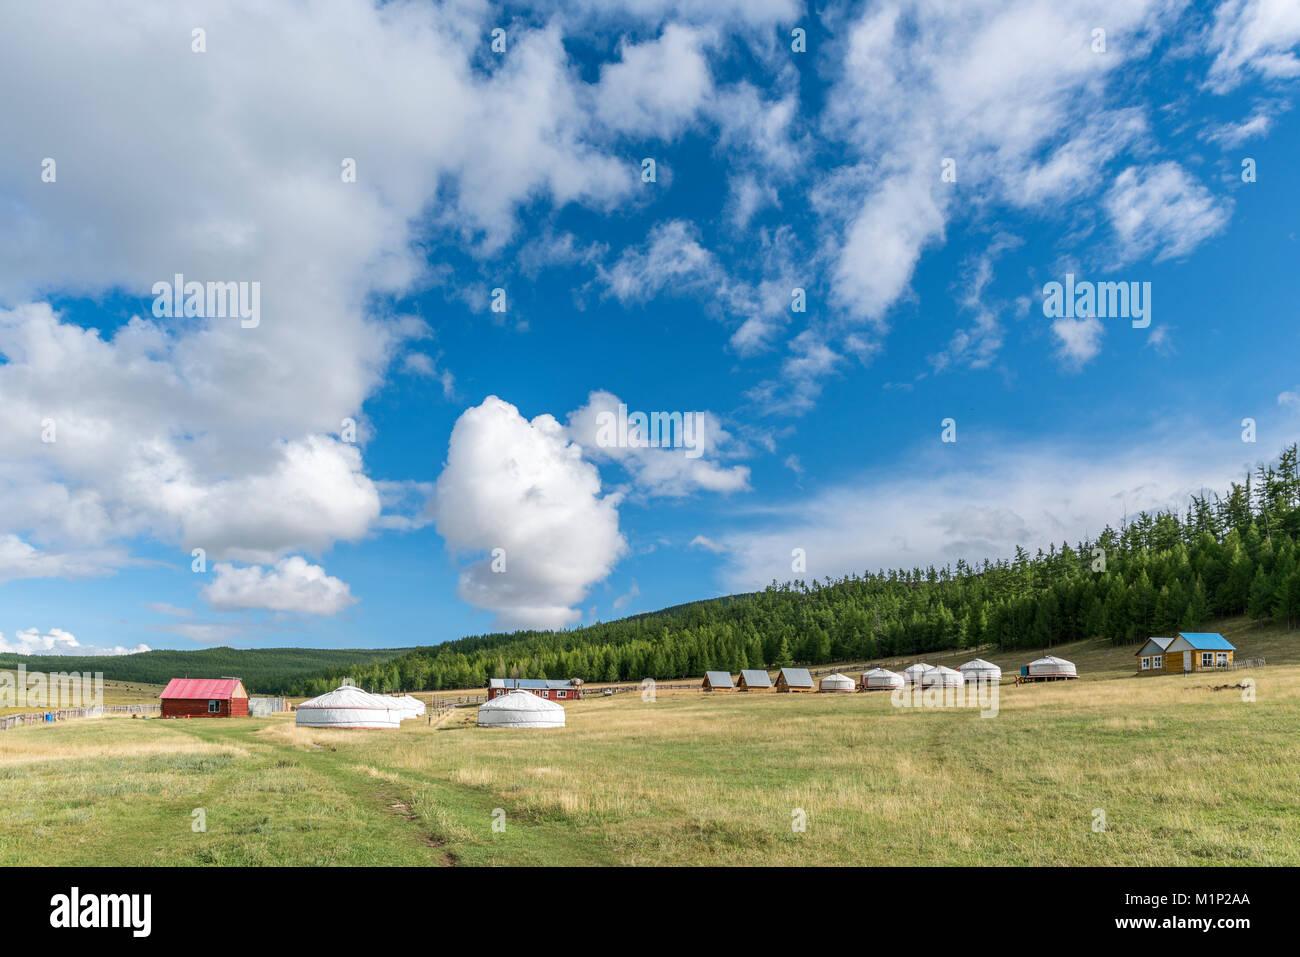 Tourist ger camp, Burentogtokh distretto, Hovsgol provincia, Mongolia, Asia Centrale, Asia Immagini Stock